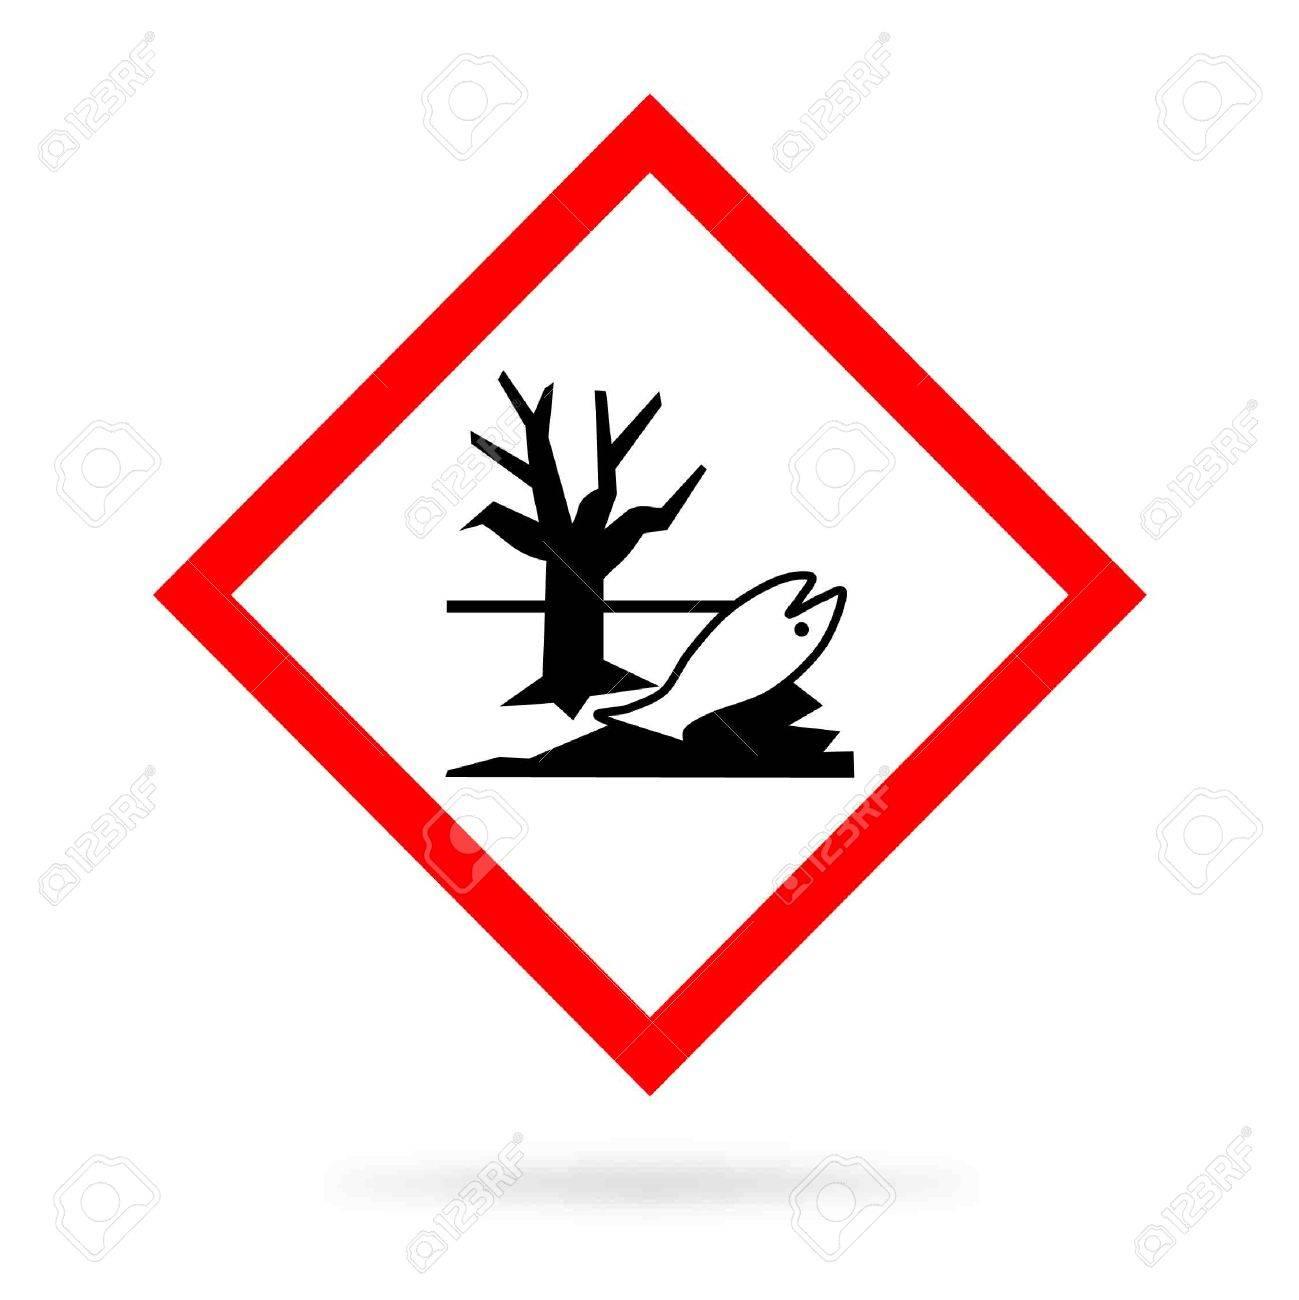 знак на бензовоз рисунок